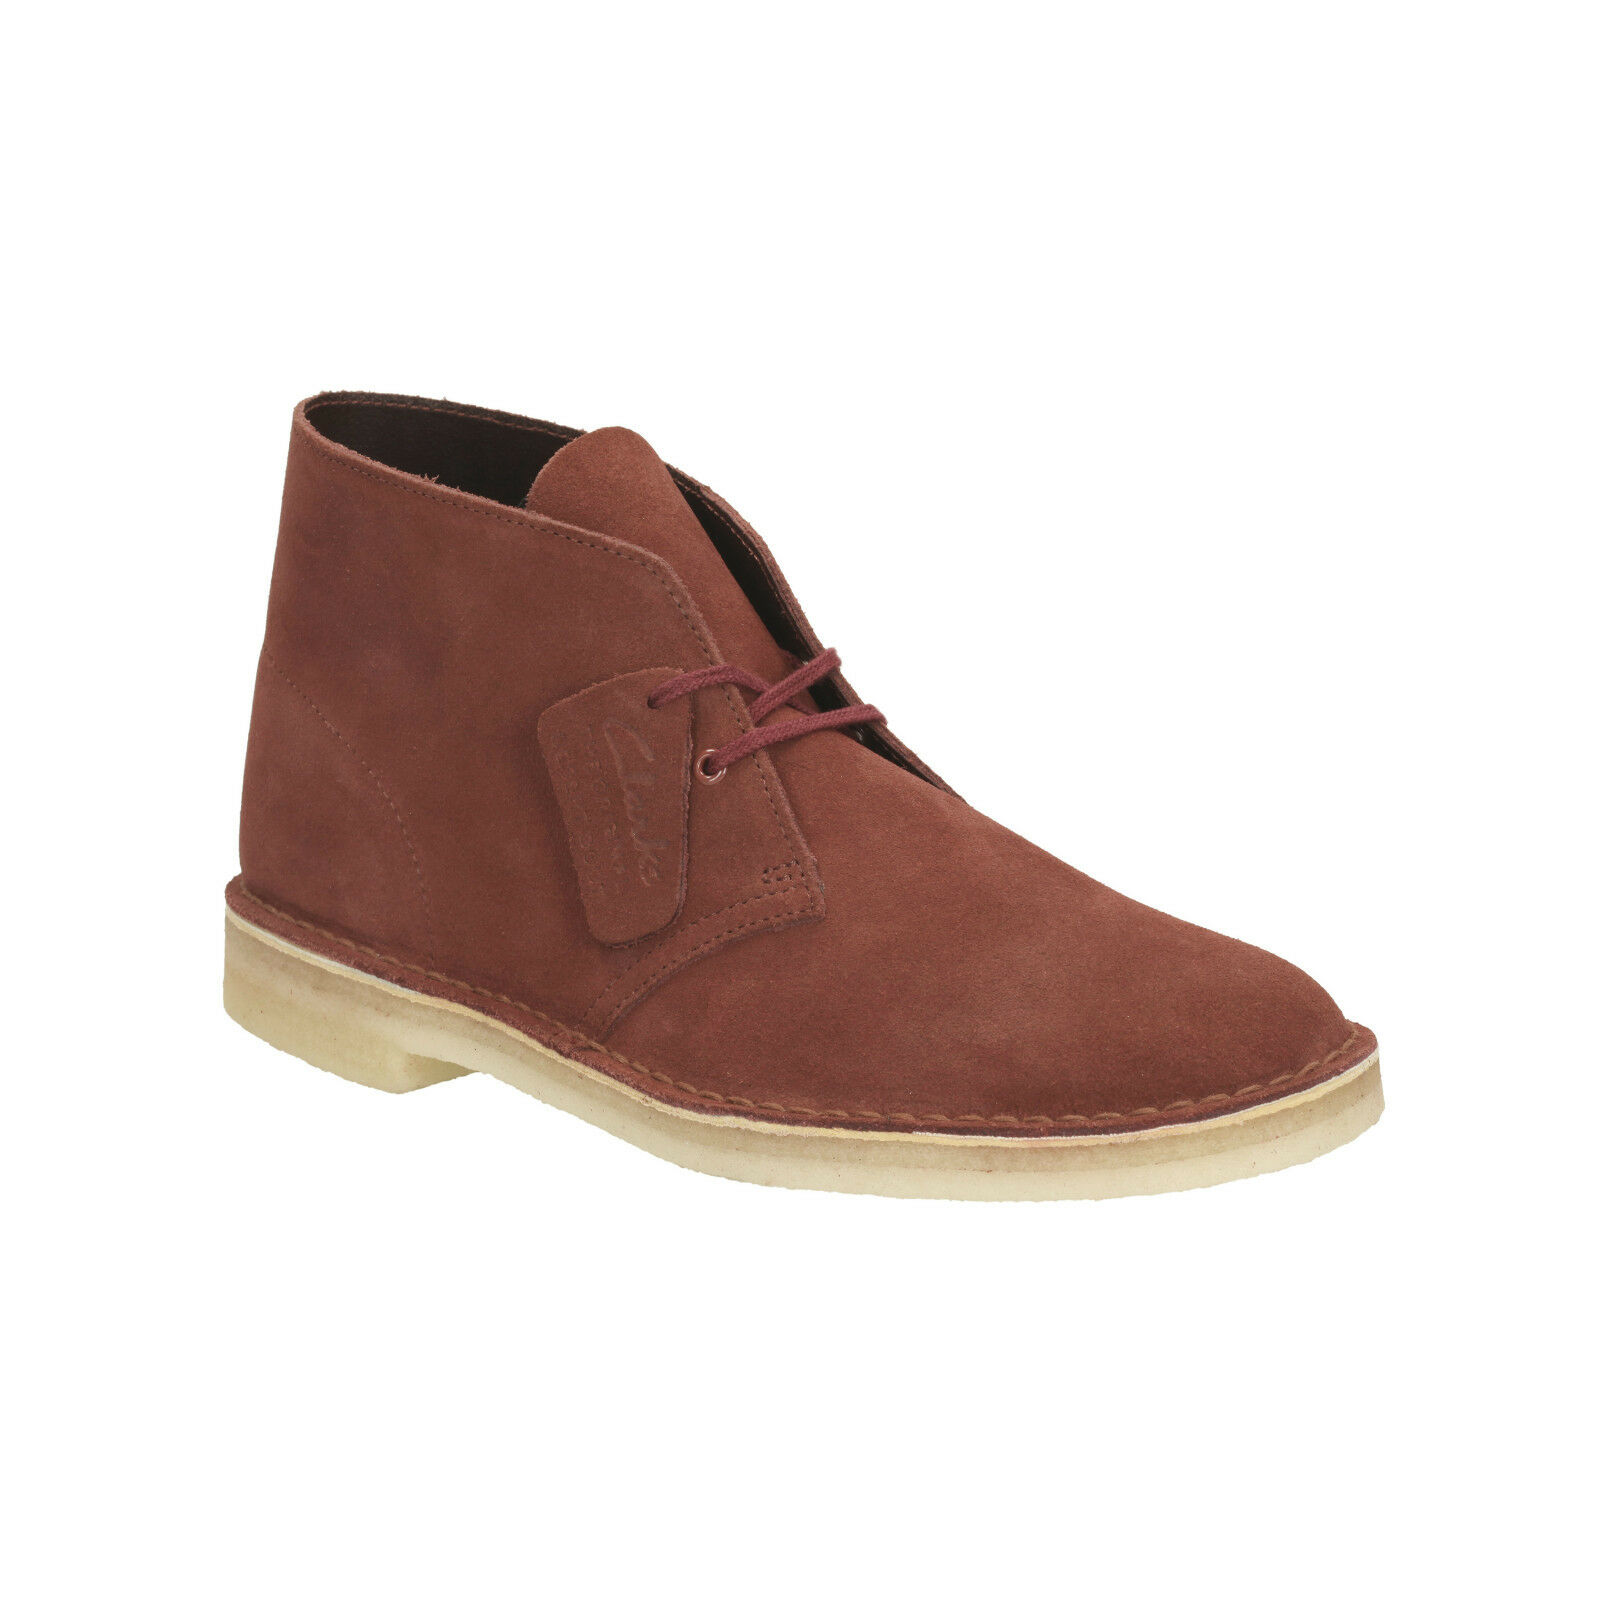 Clarks Originals Mens Desert Boot Terracotta Lace Up Suede Boot